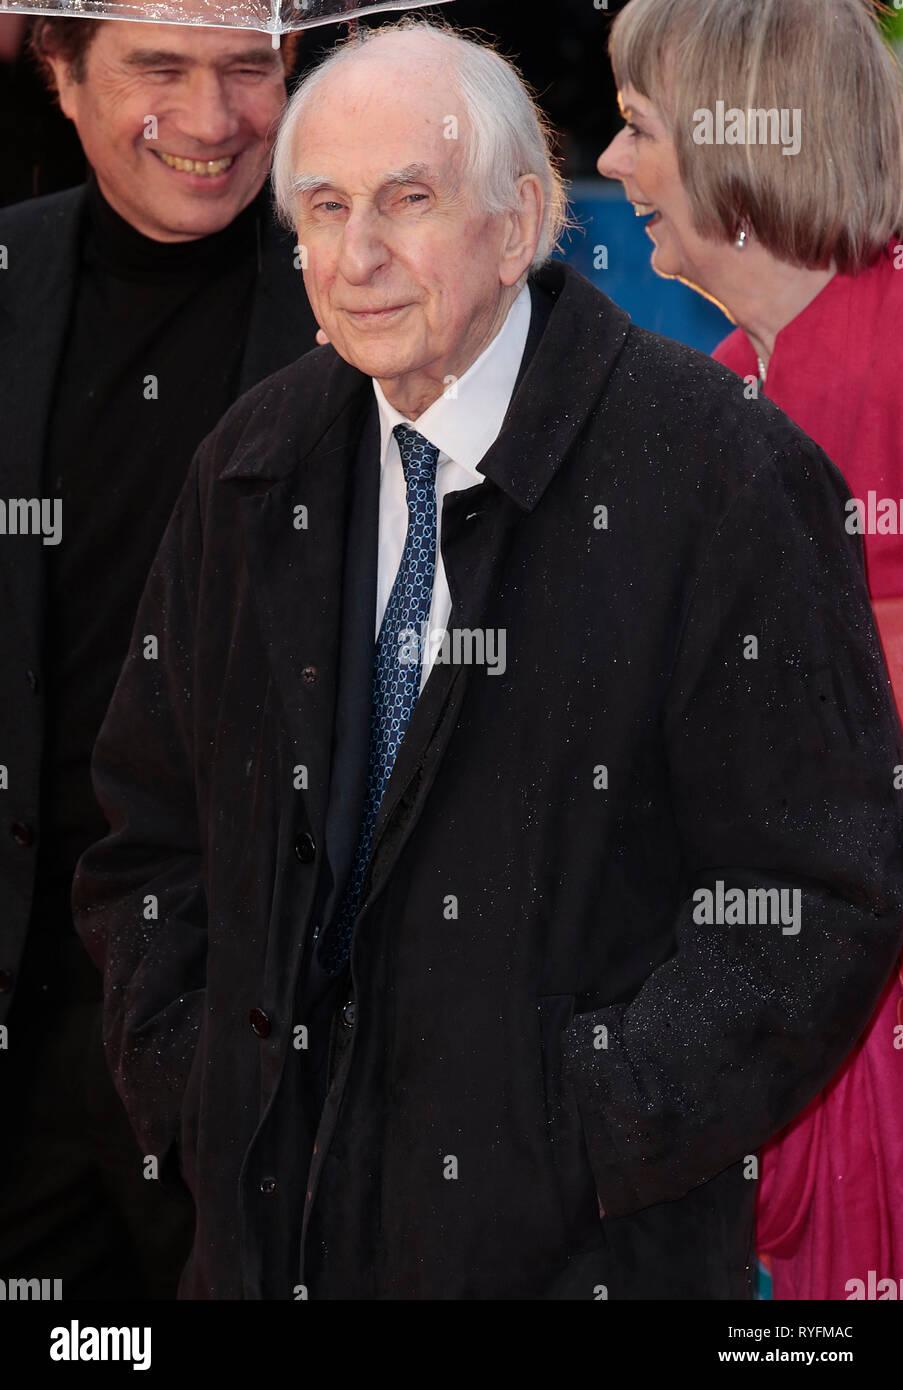 Nov 23, 2014 - London, England, UK - 'Paddington' World Premiere - Red Carpet Arrivals, Odeon, Leicester Square Photo Shows: Michael Bond - Stock Image